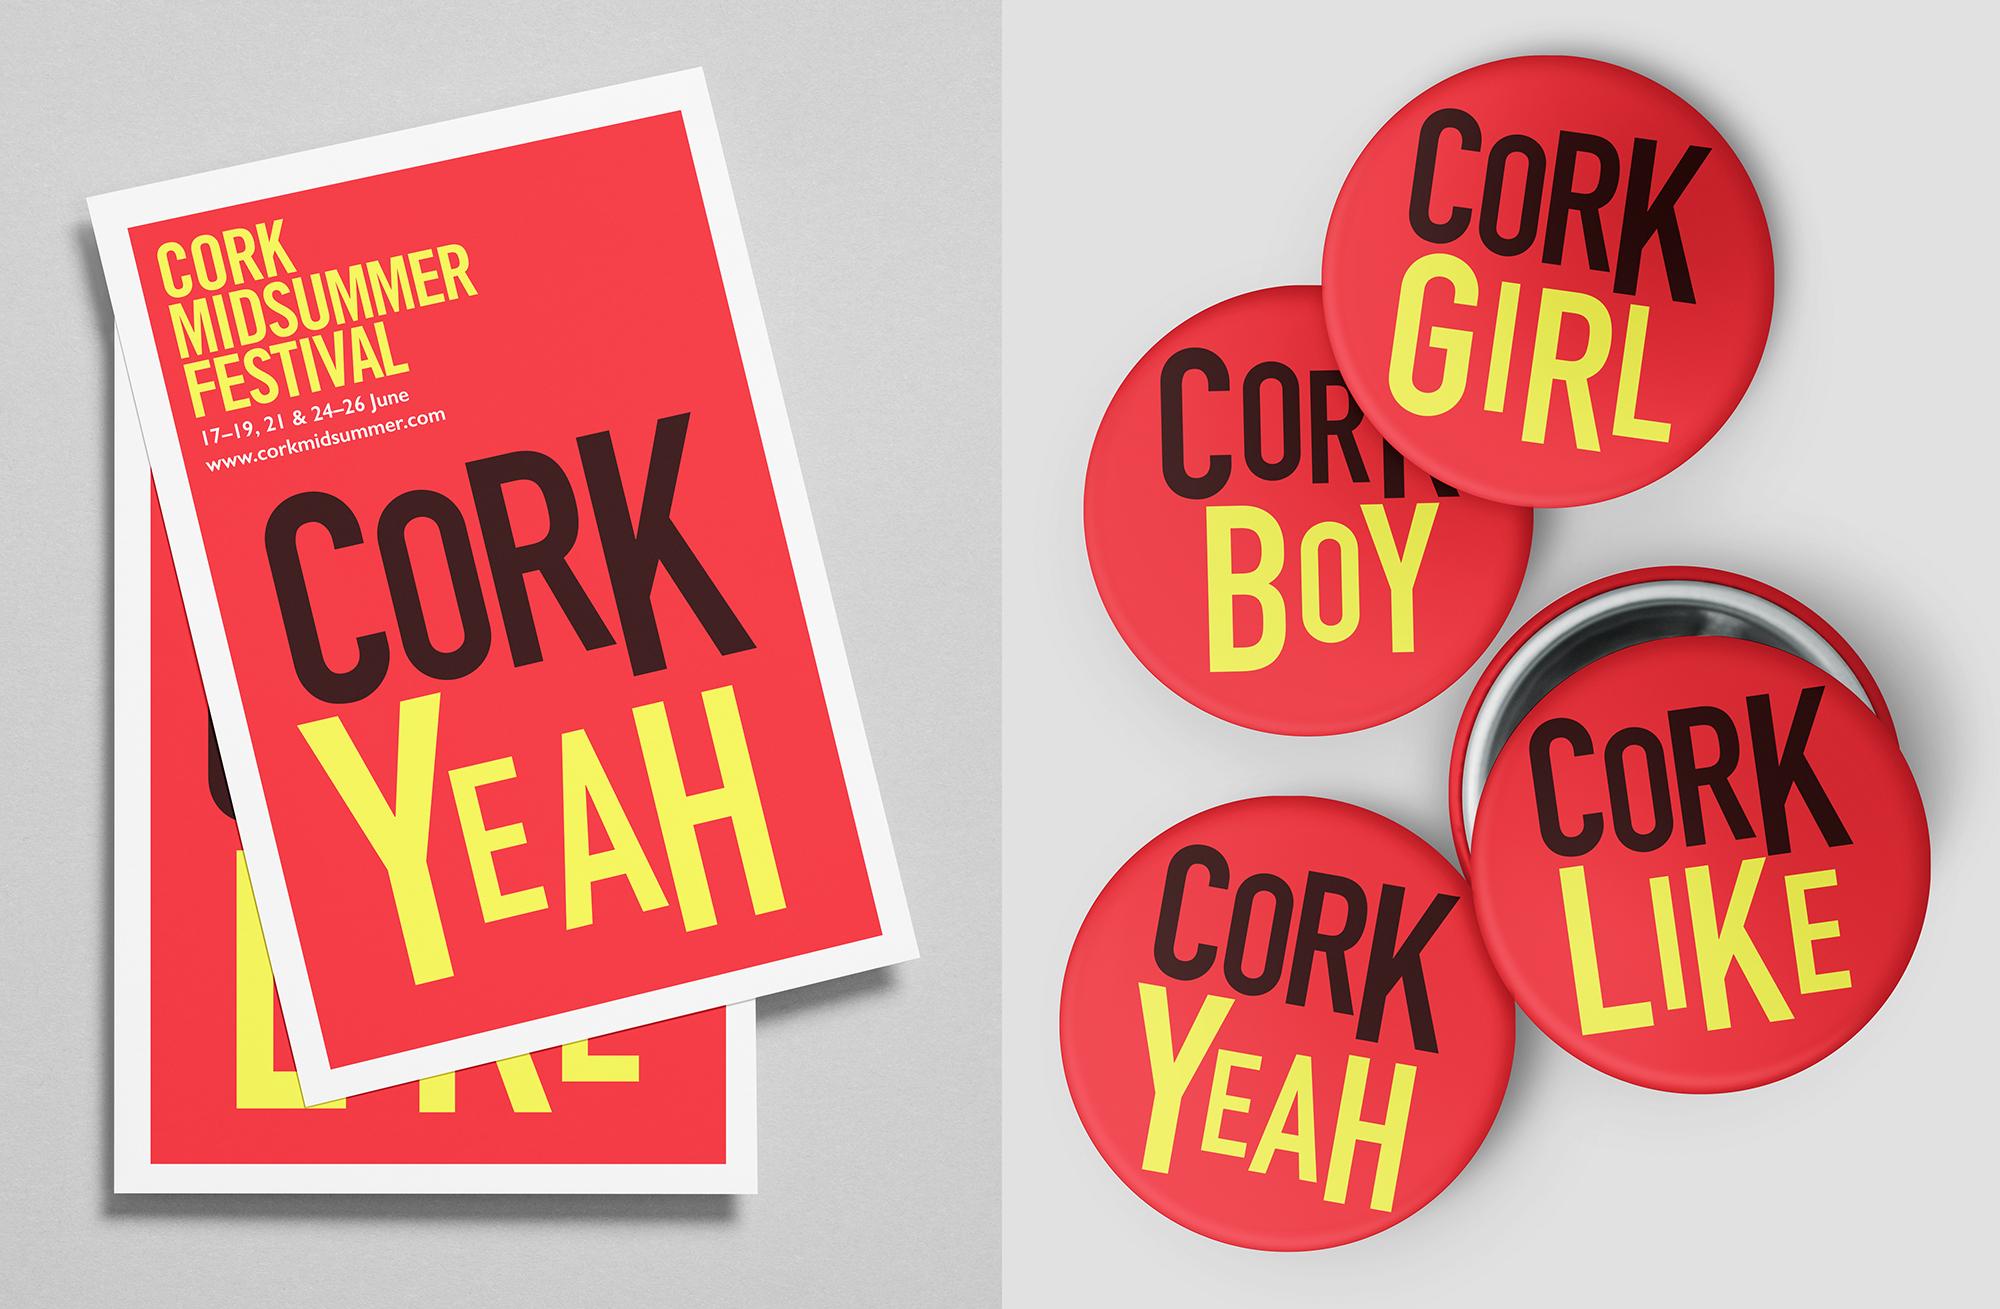 Cover image: Cork Midsummer Festival